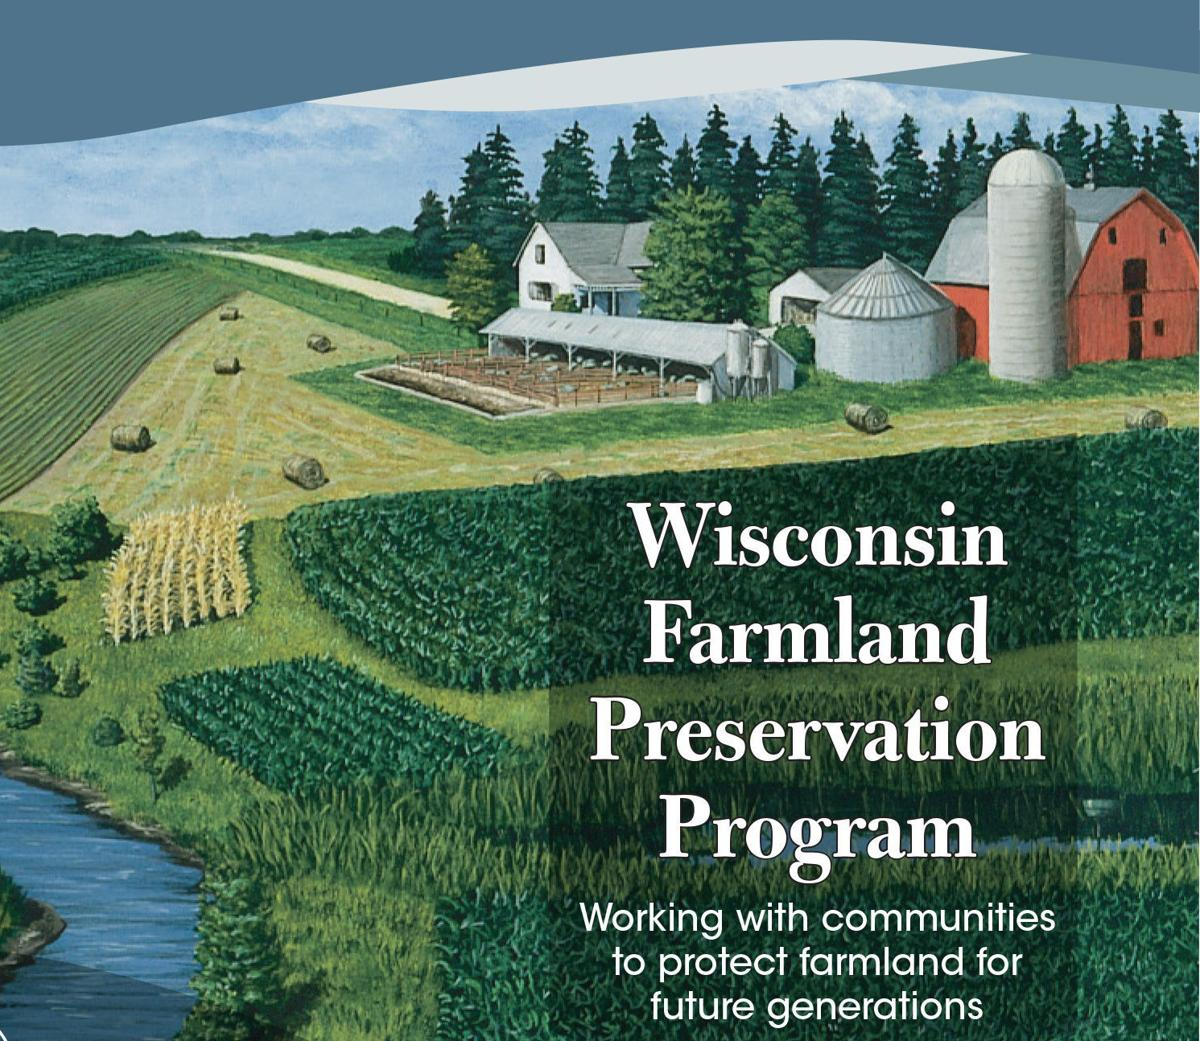 Wisconsin Farmland Preservation Program graphic